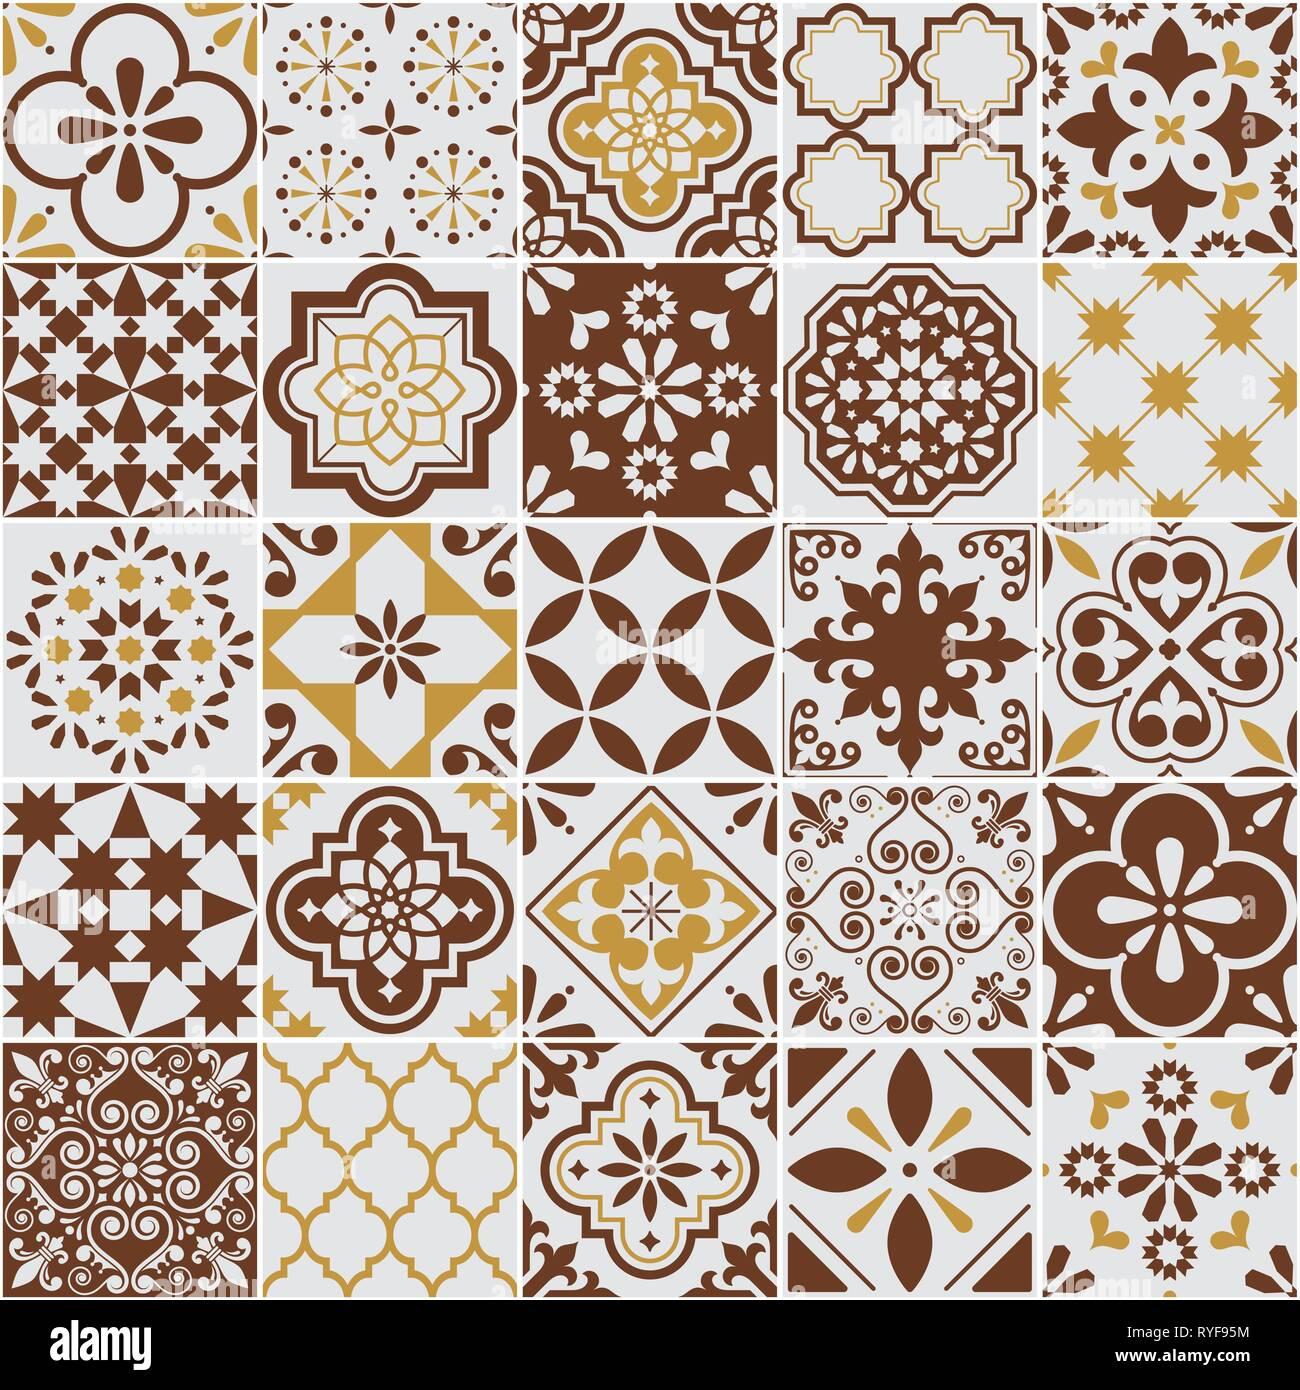 Lisbon Azulejos tile vector pattern, Portuguese or Spanish retro old tiles mosaic, Mediterranean seamless brown design - Stock Vector